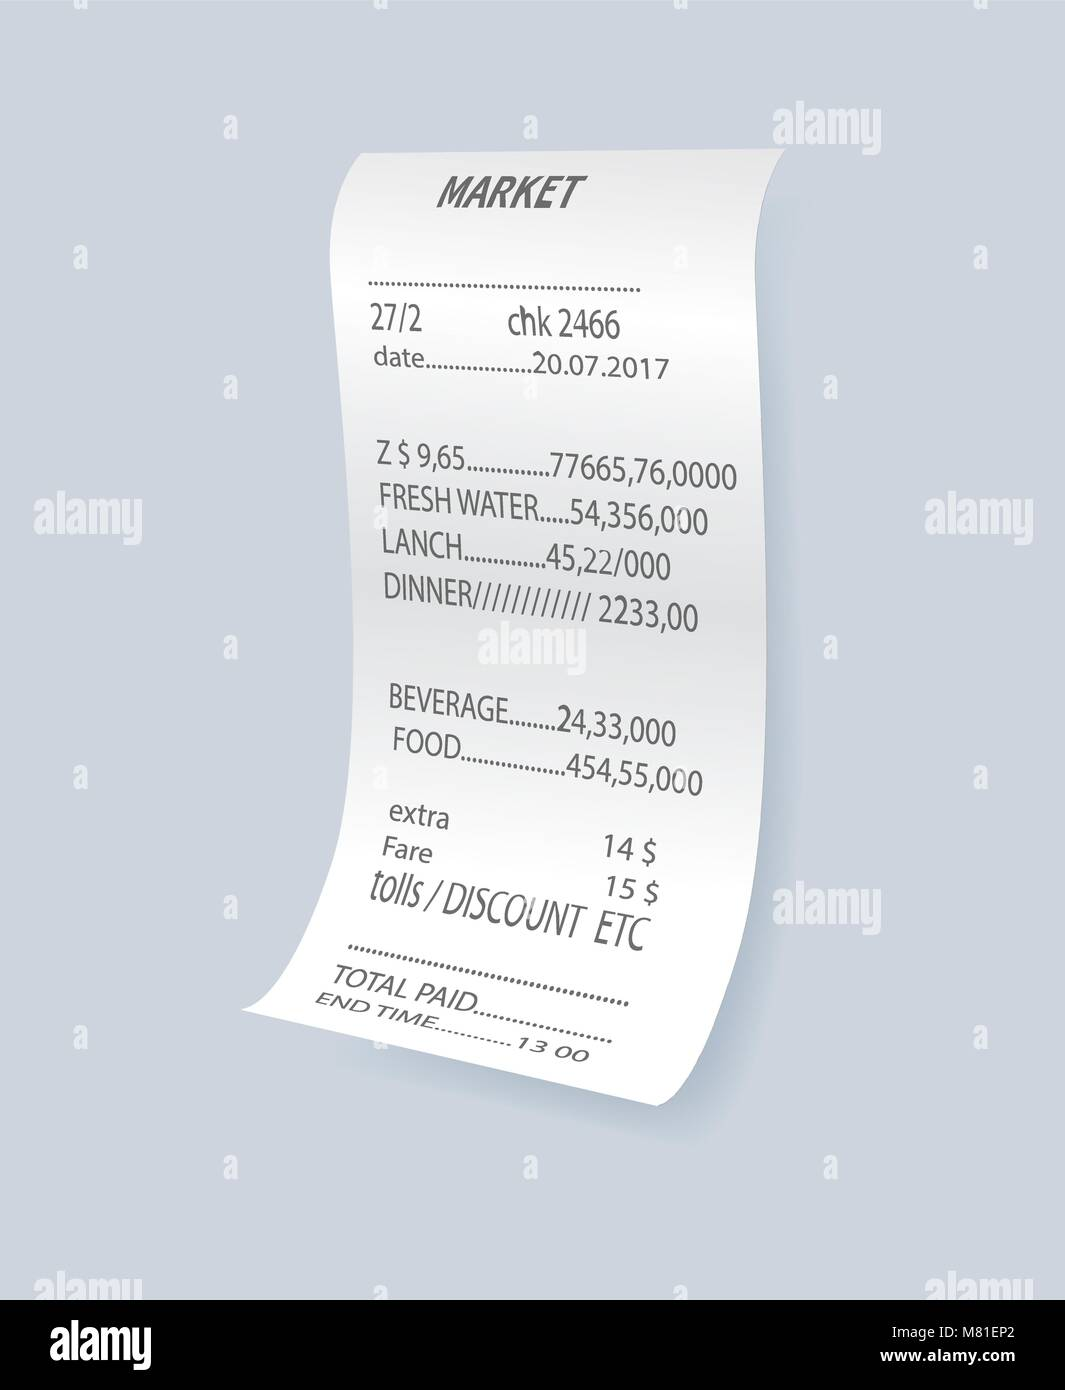 Supermarket Paper Check Receipt Bill Stockfotos & Supermarket Paper ...